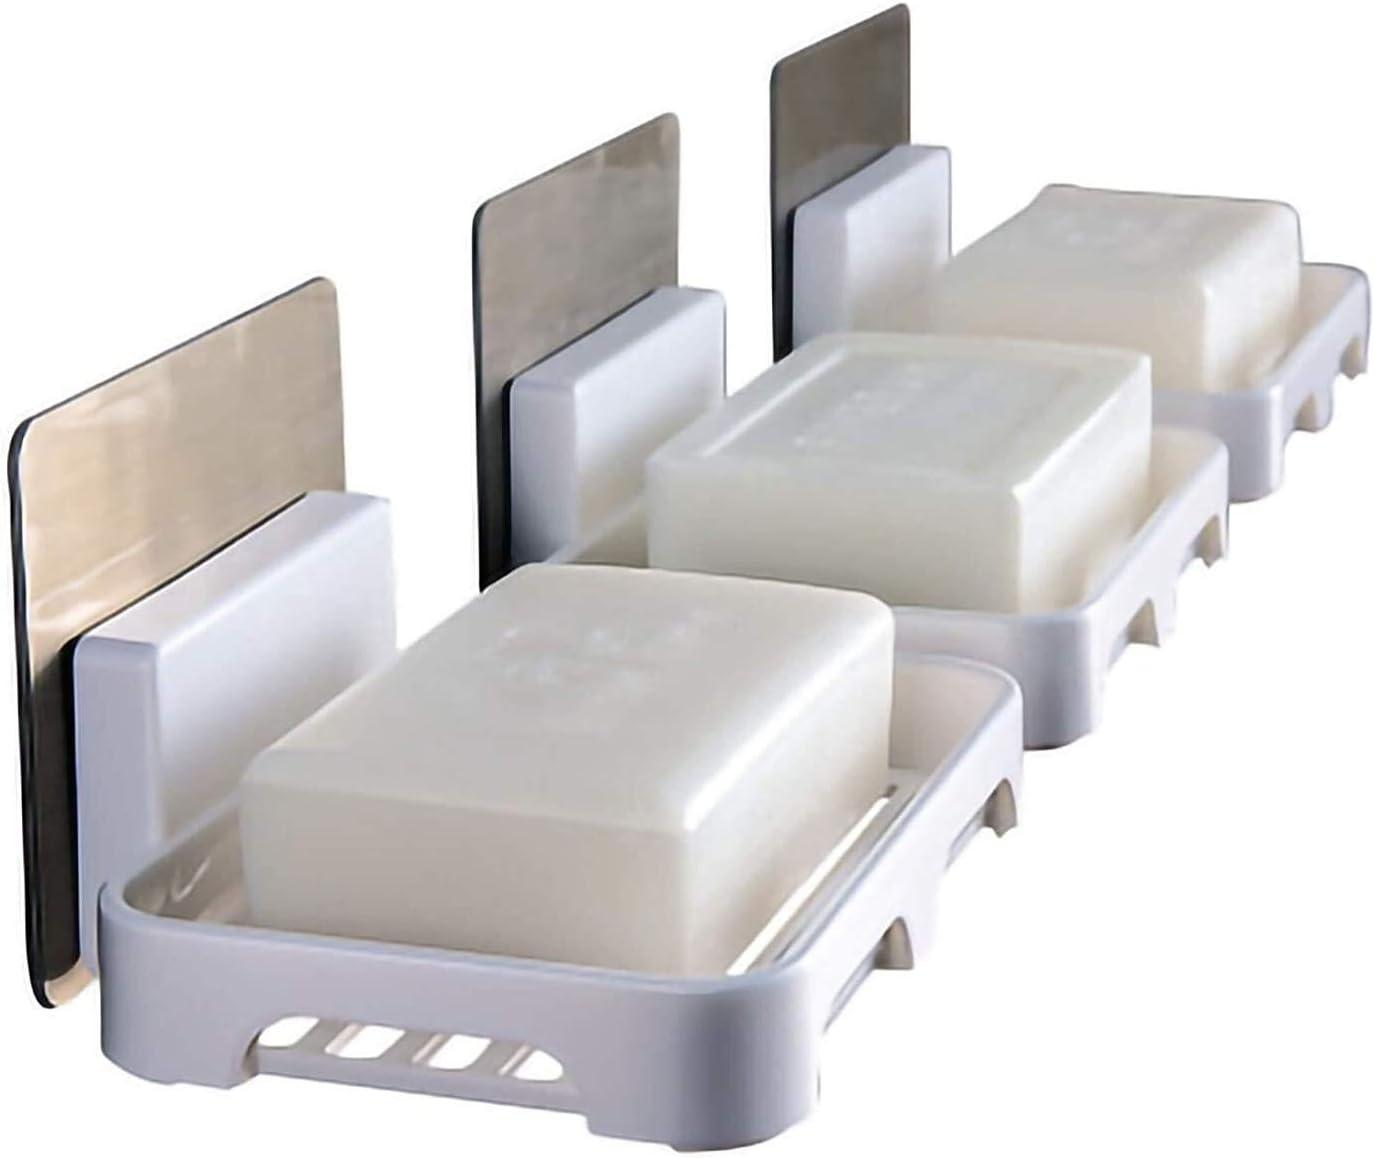 Shreem85 40% OFF Cheap Sale Bathroom Nippon regular agency Shelf Soap Dispenser Perforation-Free